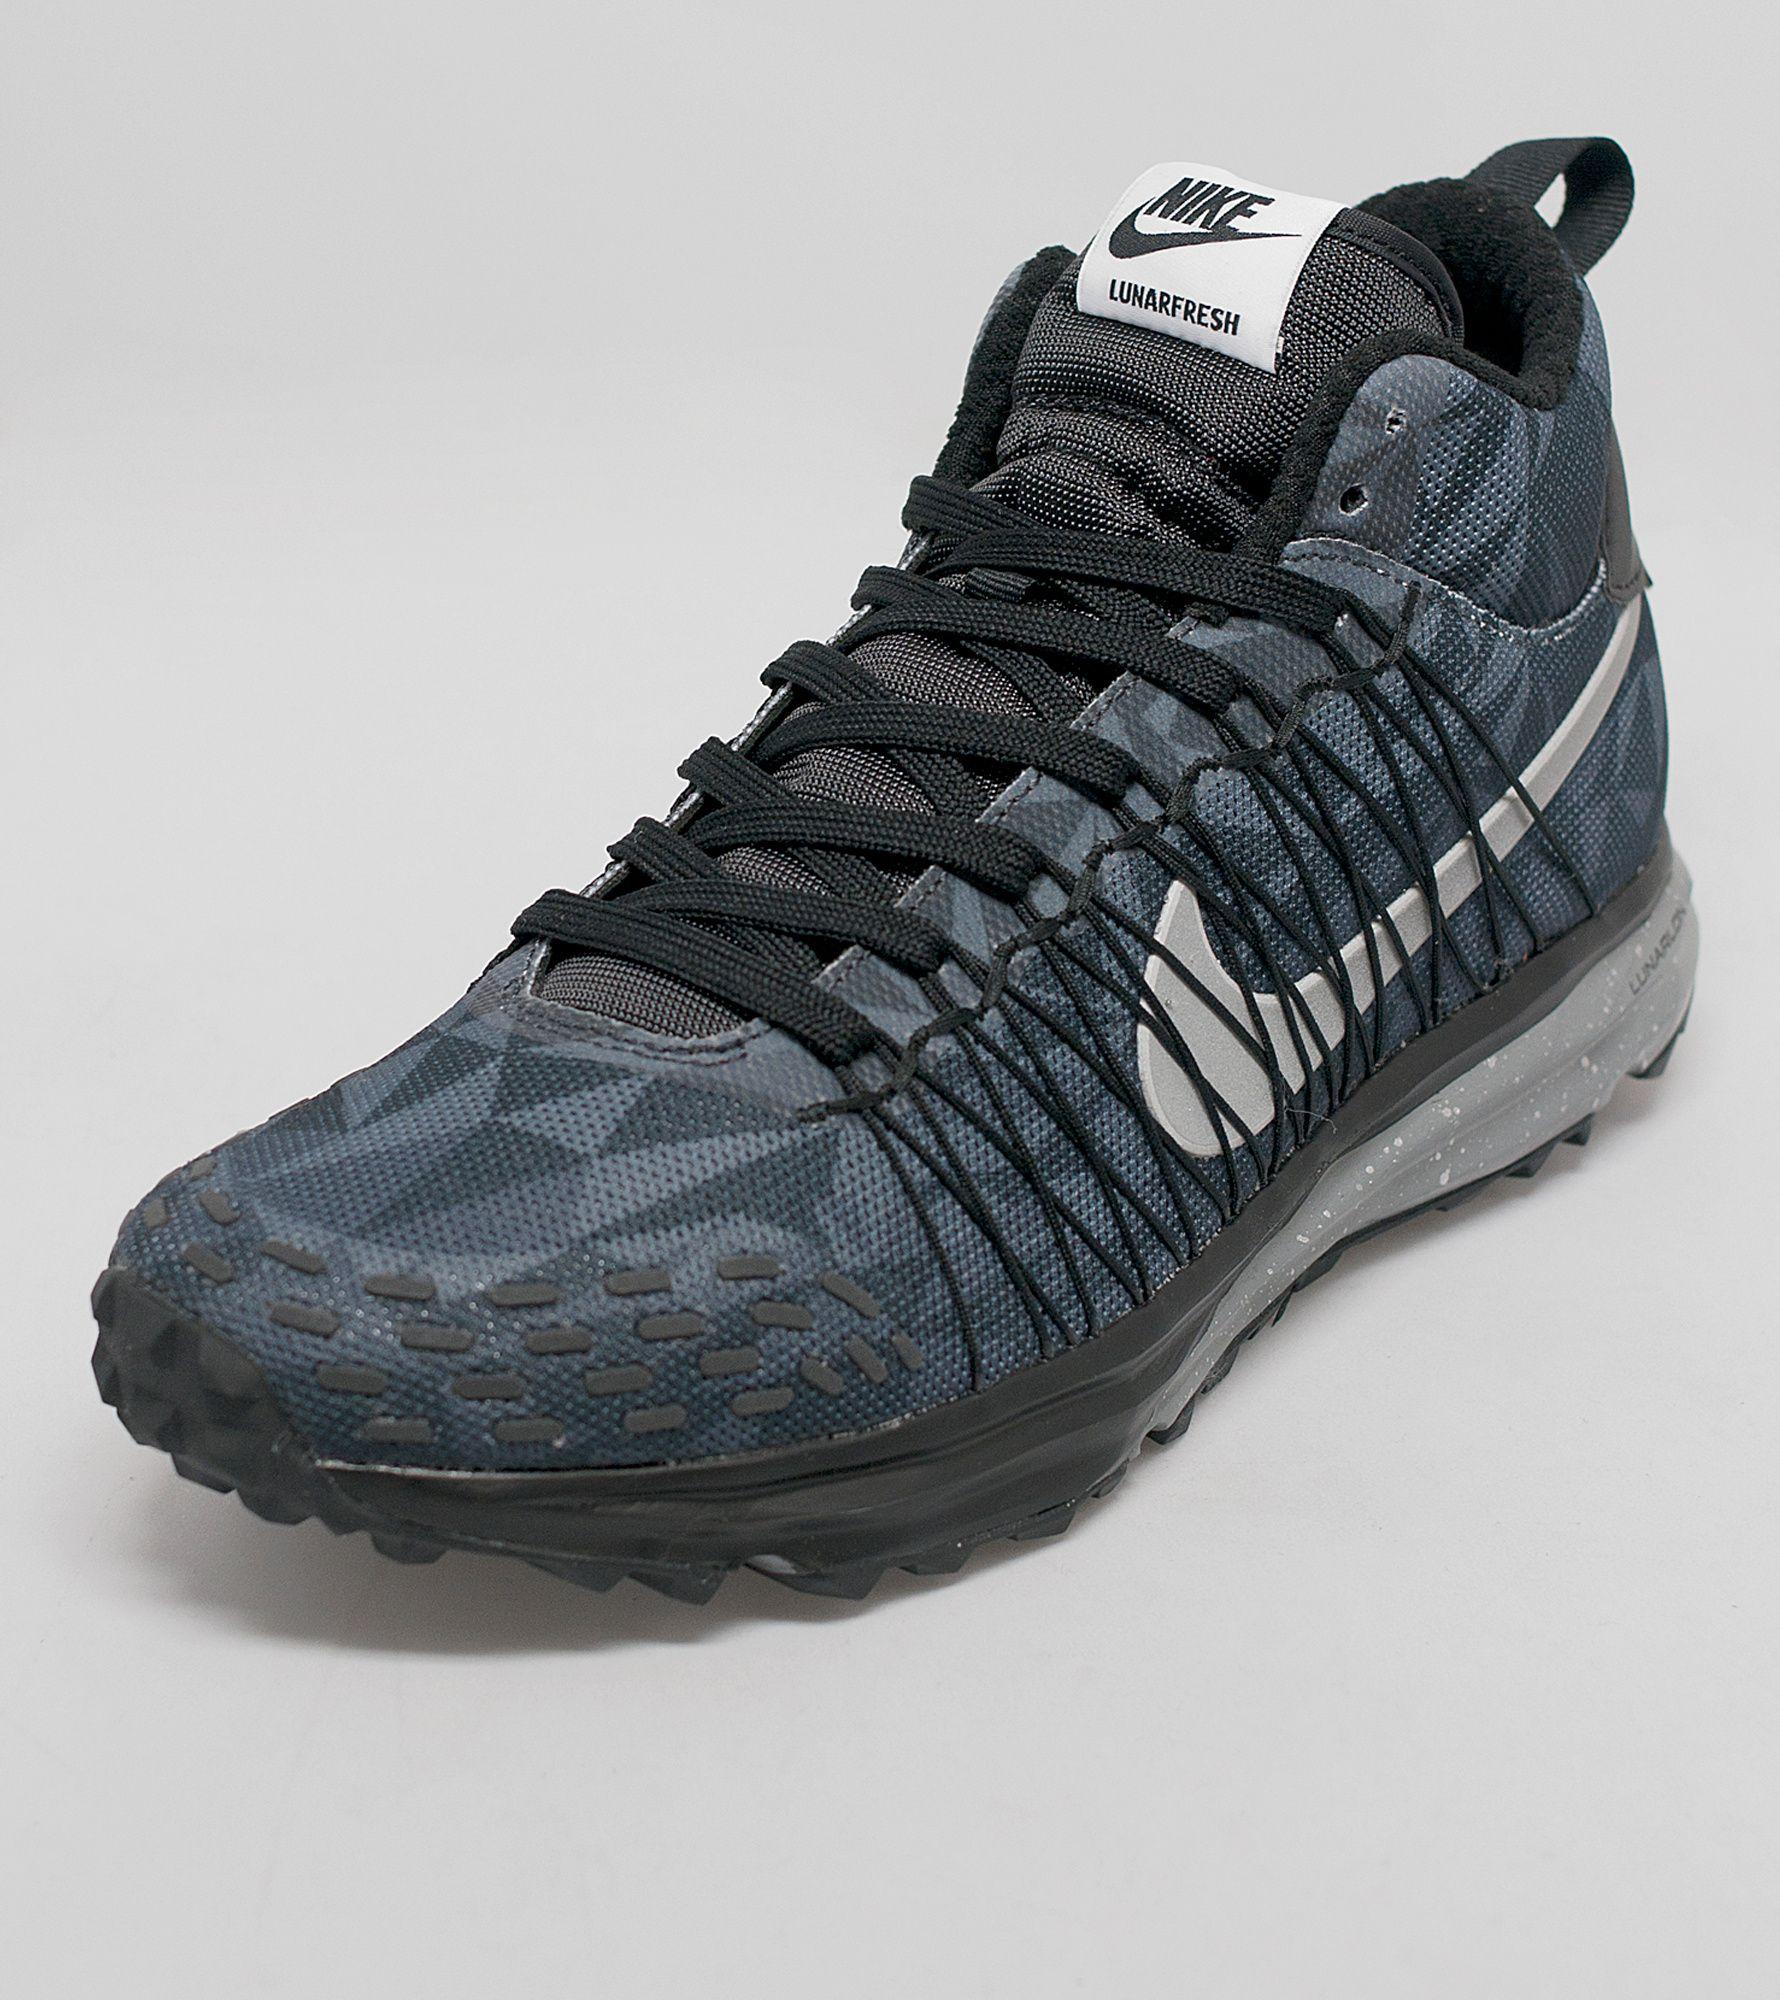 big sale 99928 496a9 ... 50% off nike lunar fresh sneakerboot 000fa d1c3d